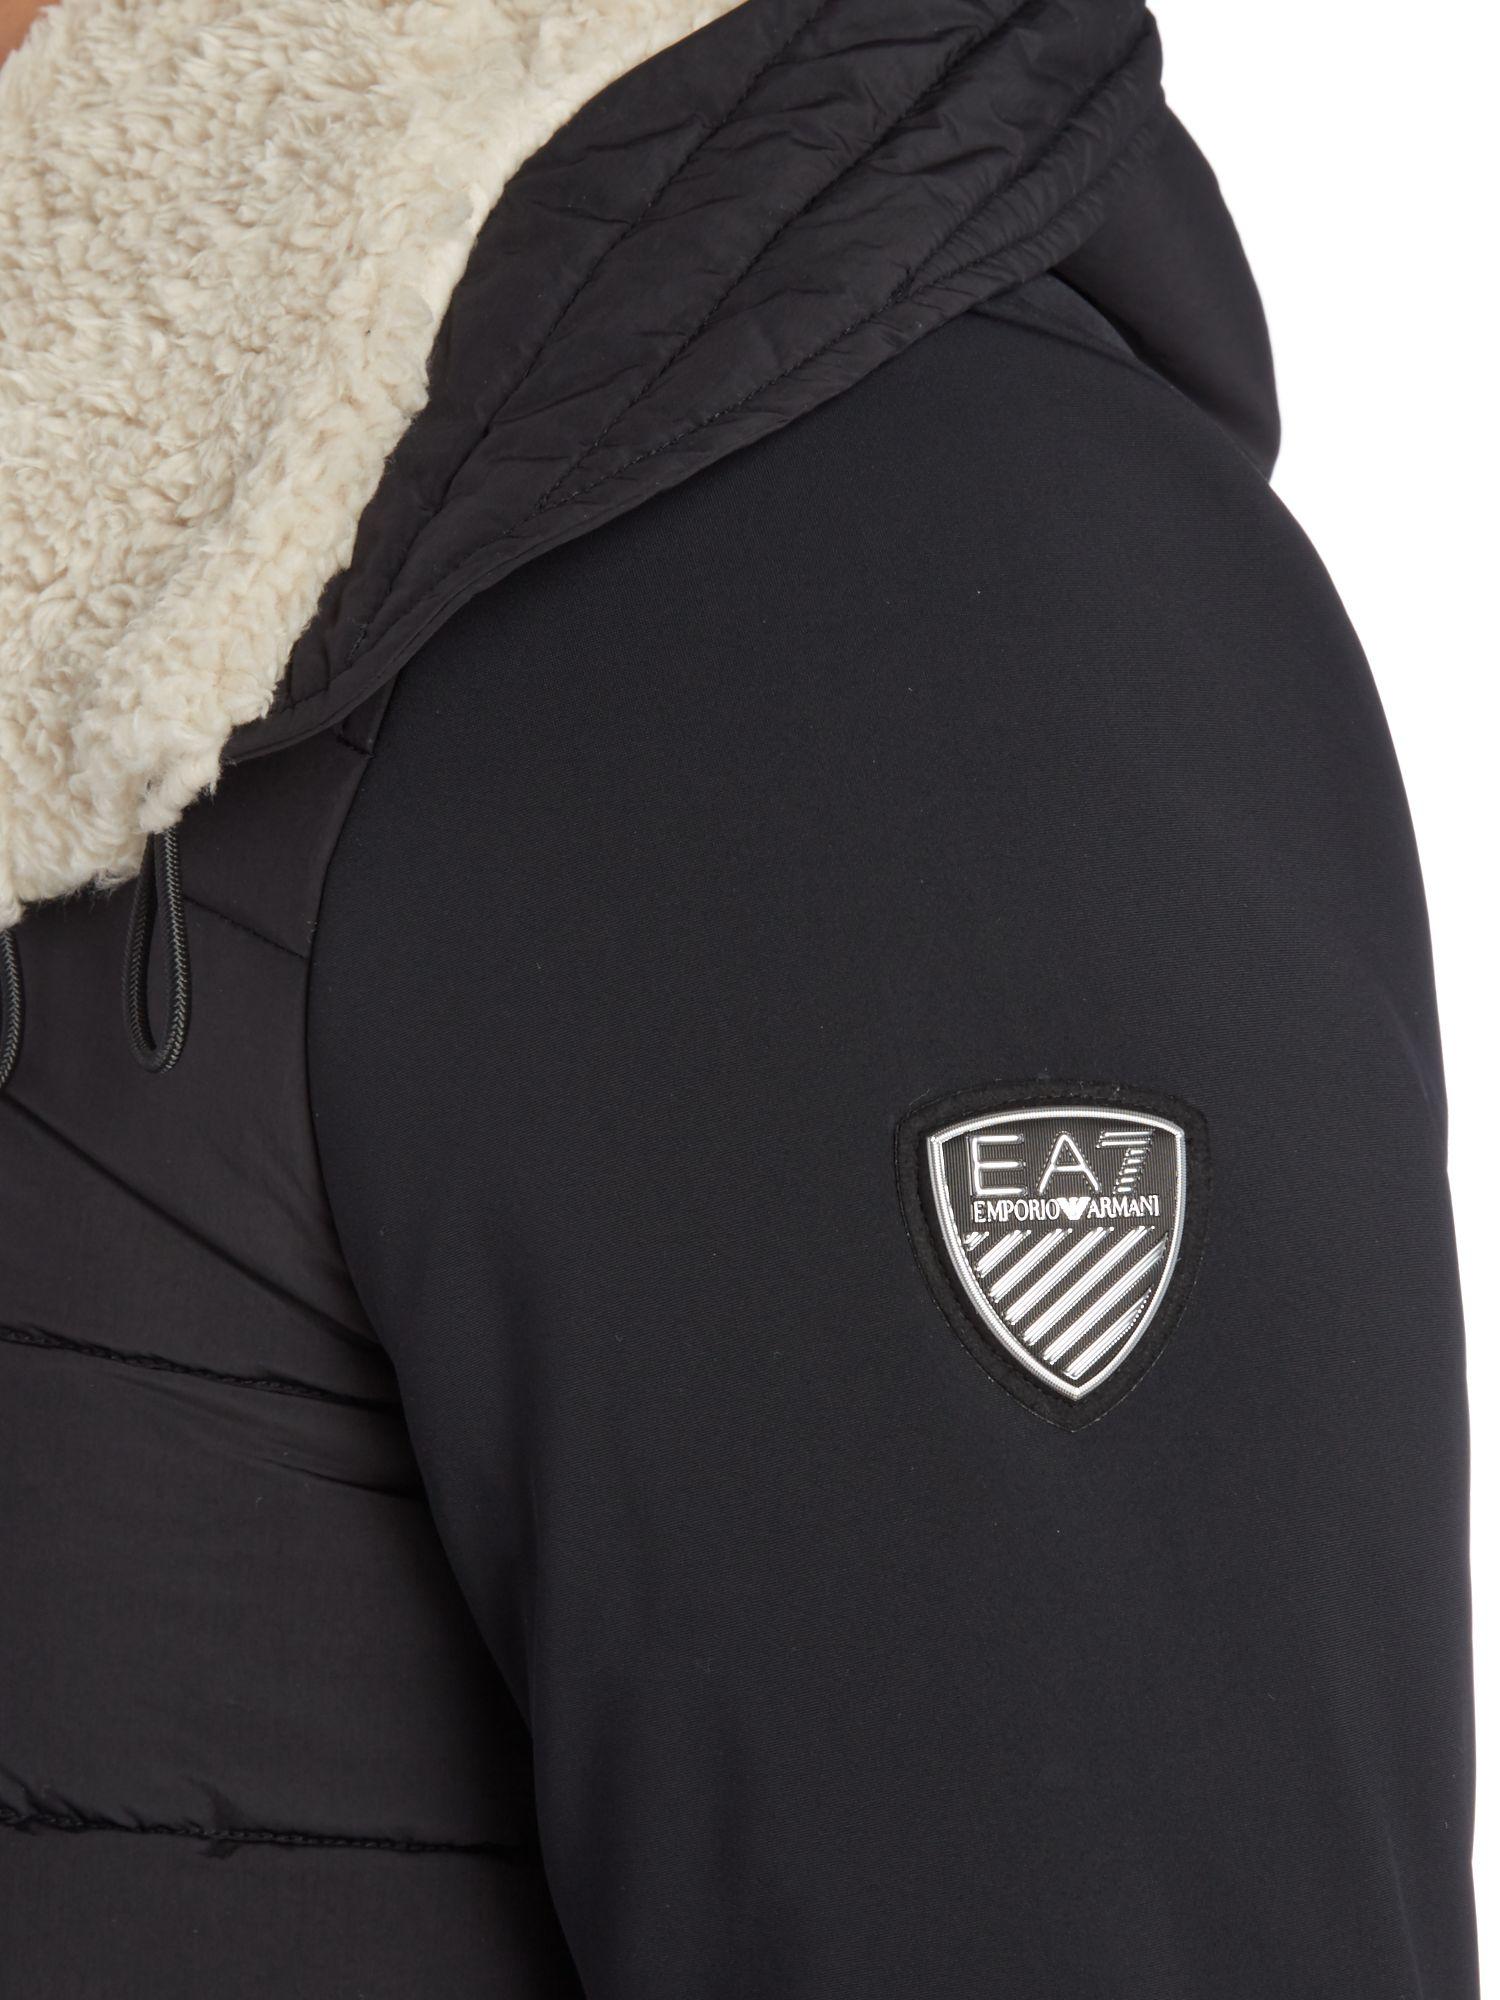 EA7 Synthetic Mountain Parka in Black for Men